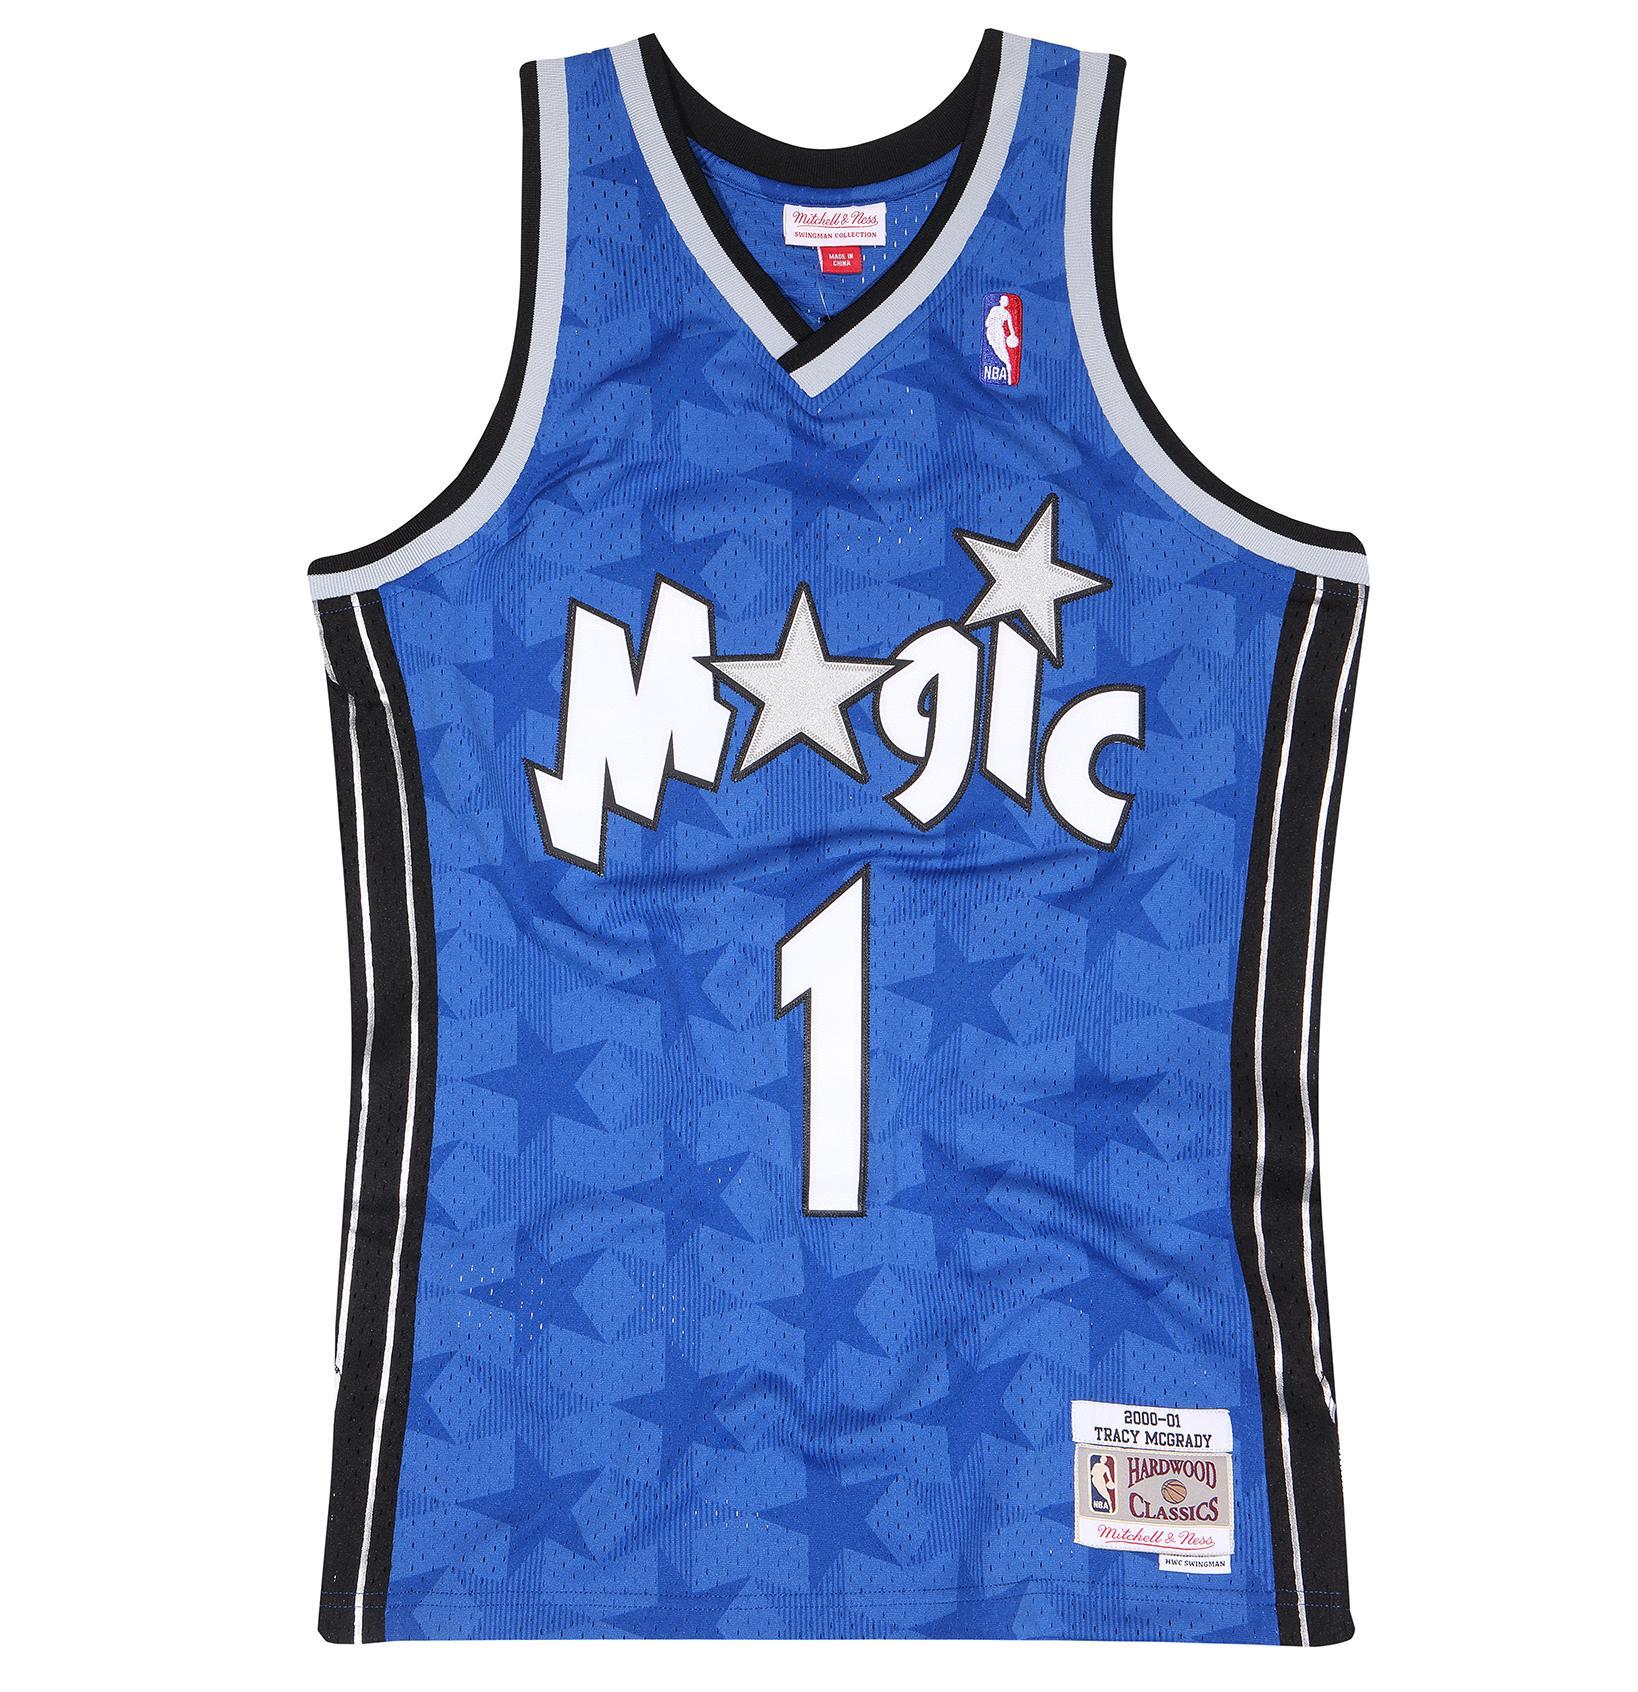 82563f6f6 Tracy McGrady 2000-01 Swingman Jersey Orlando Magic